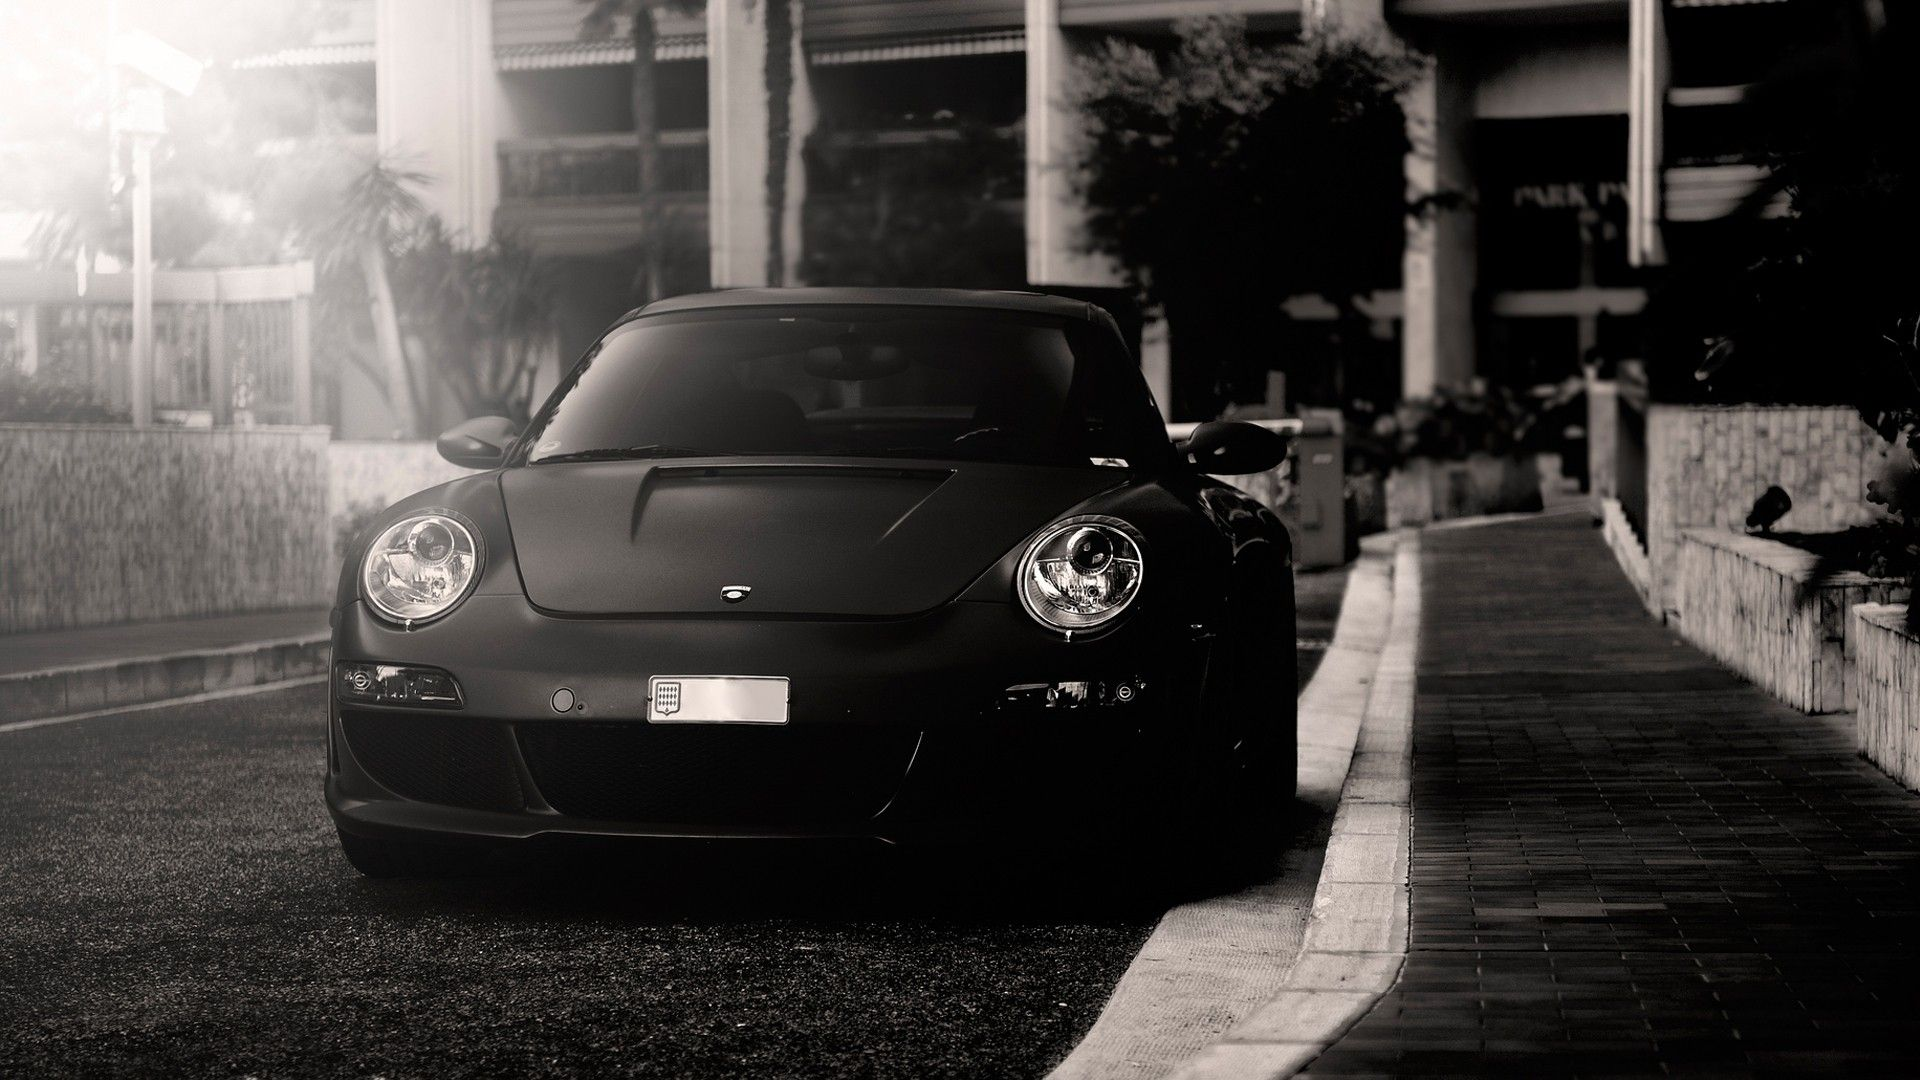 سيارات سوداء فقط 3 Hd Porsche 911 Porsche Cars